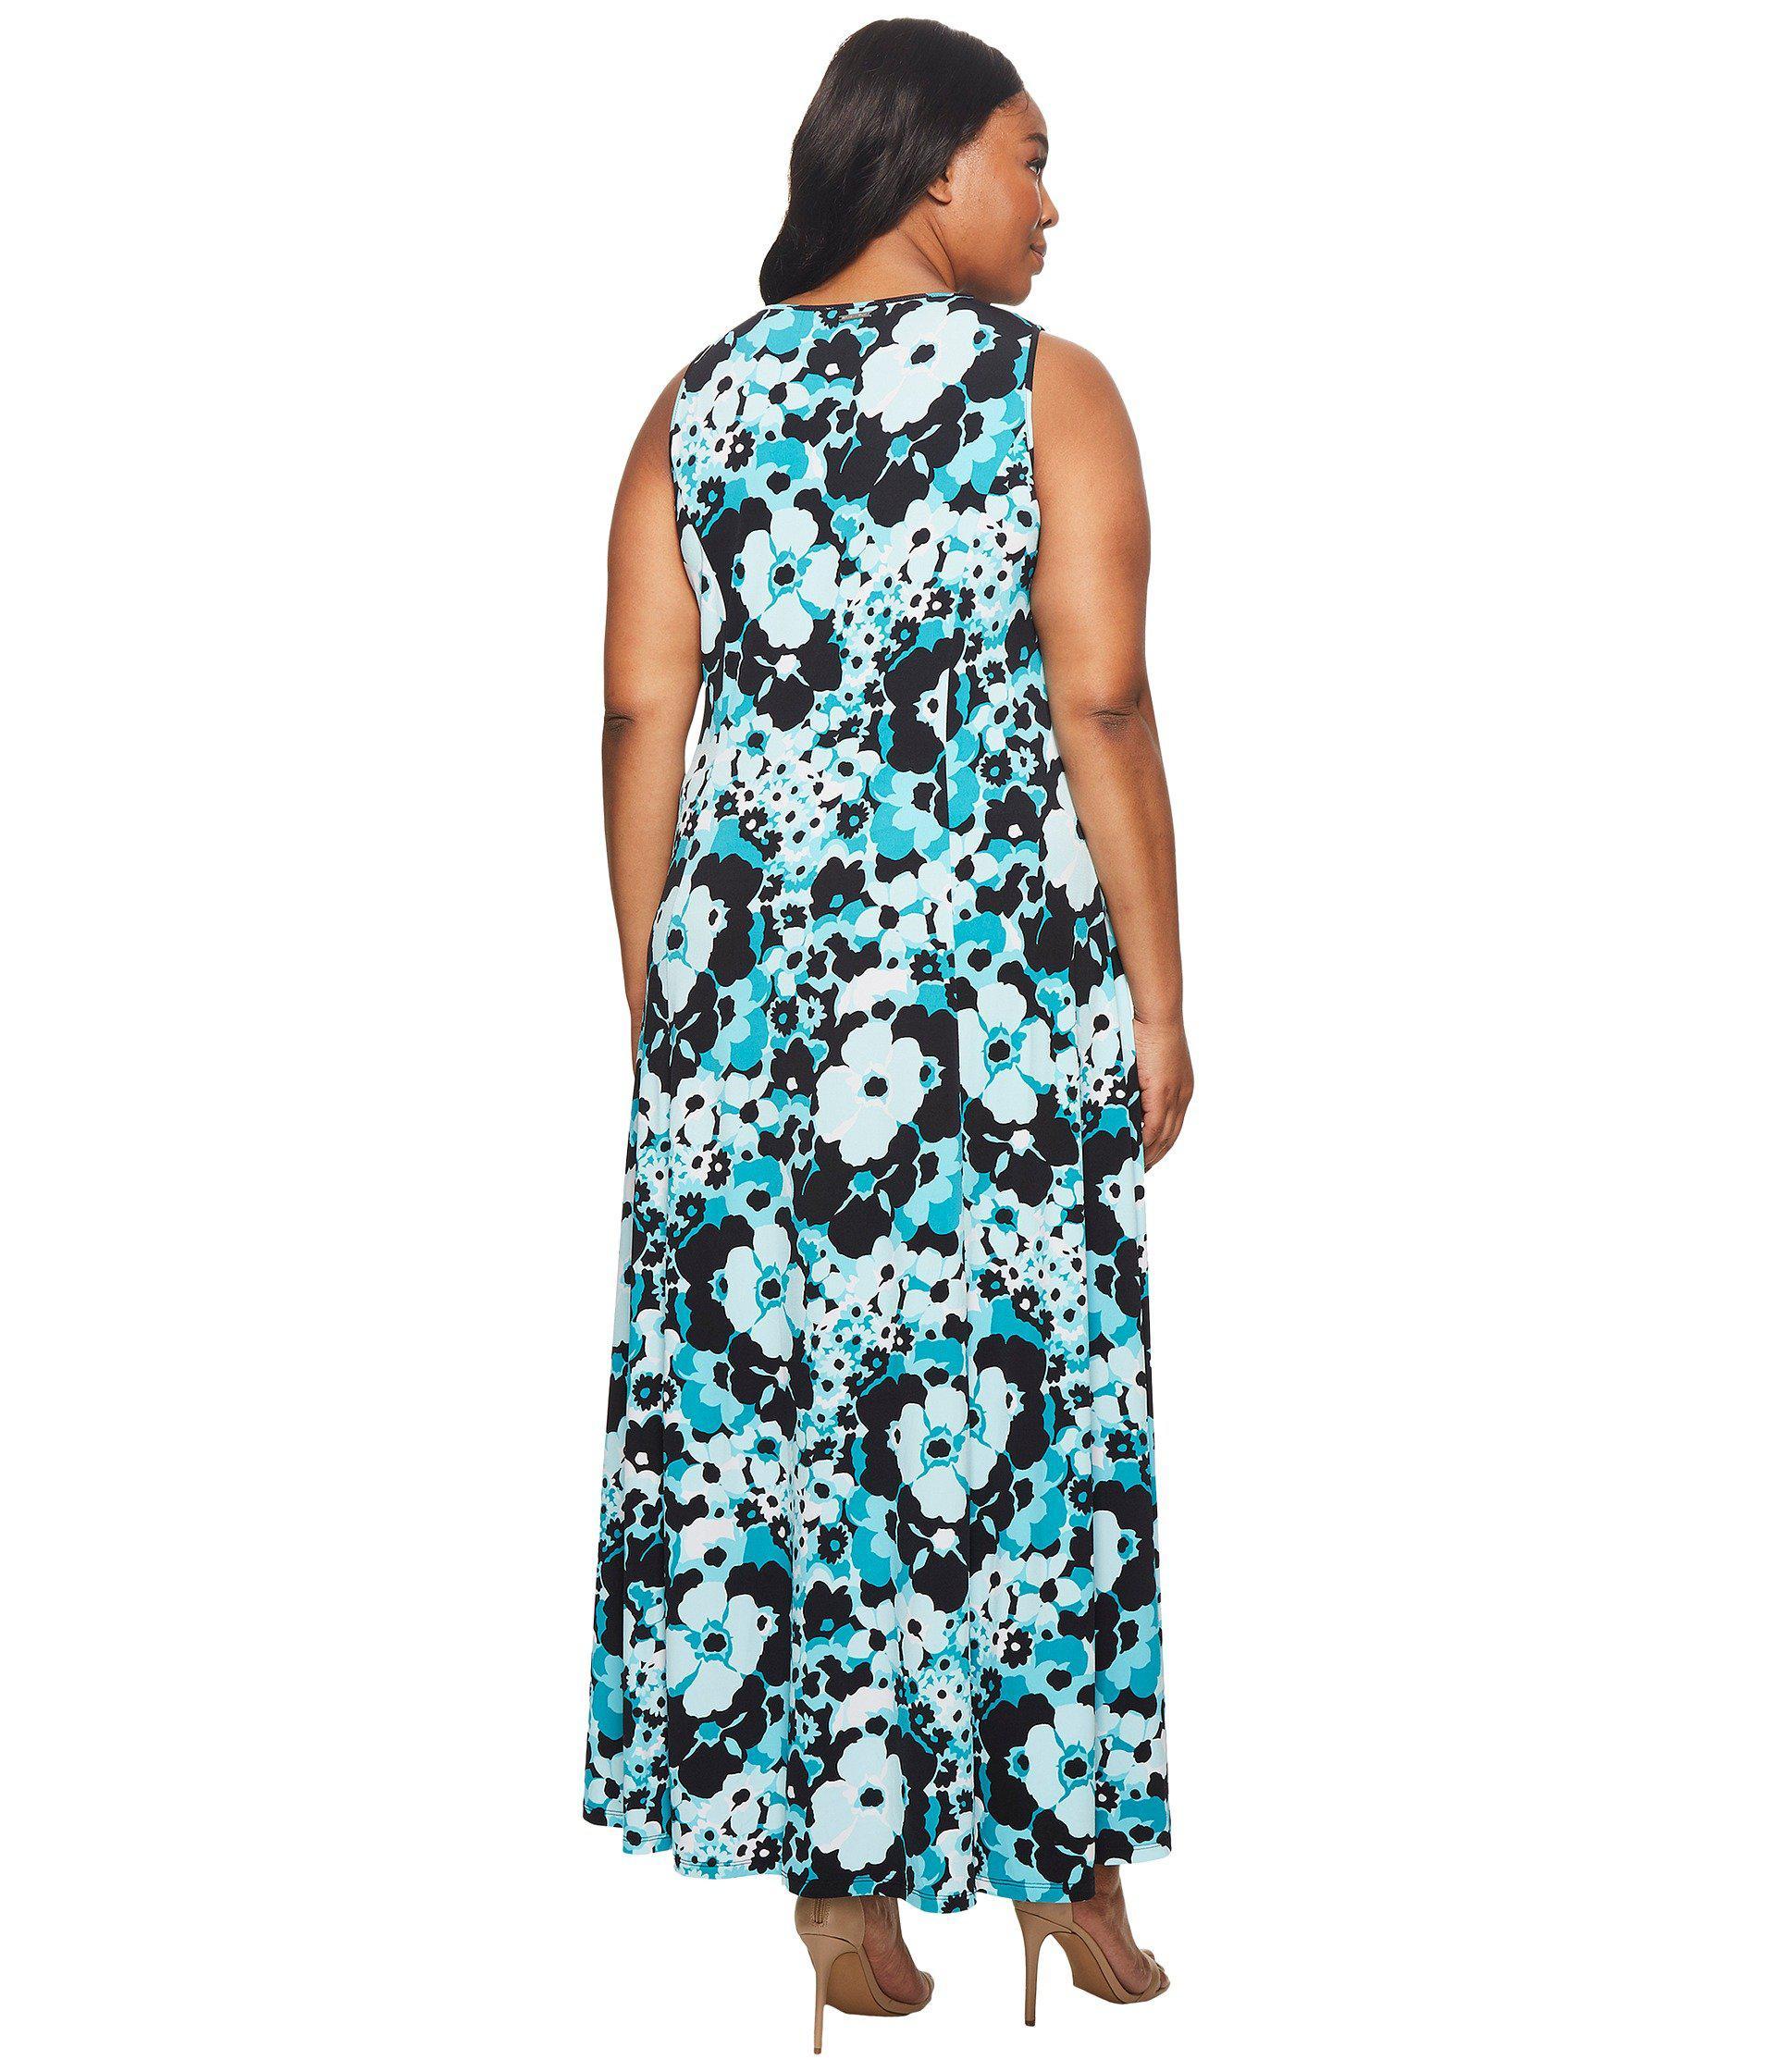 Plus Size Spring Floral Maxi Tank Dress (tile Blue/black Multi) Dress